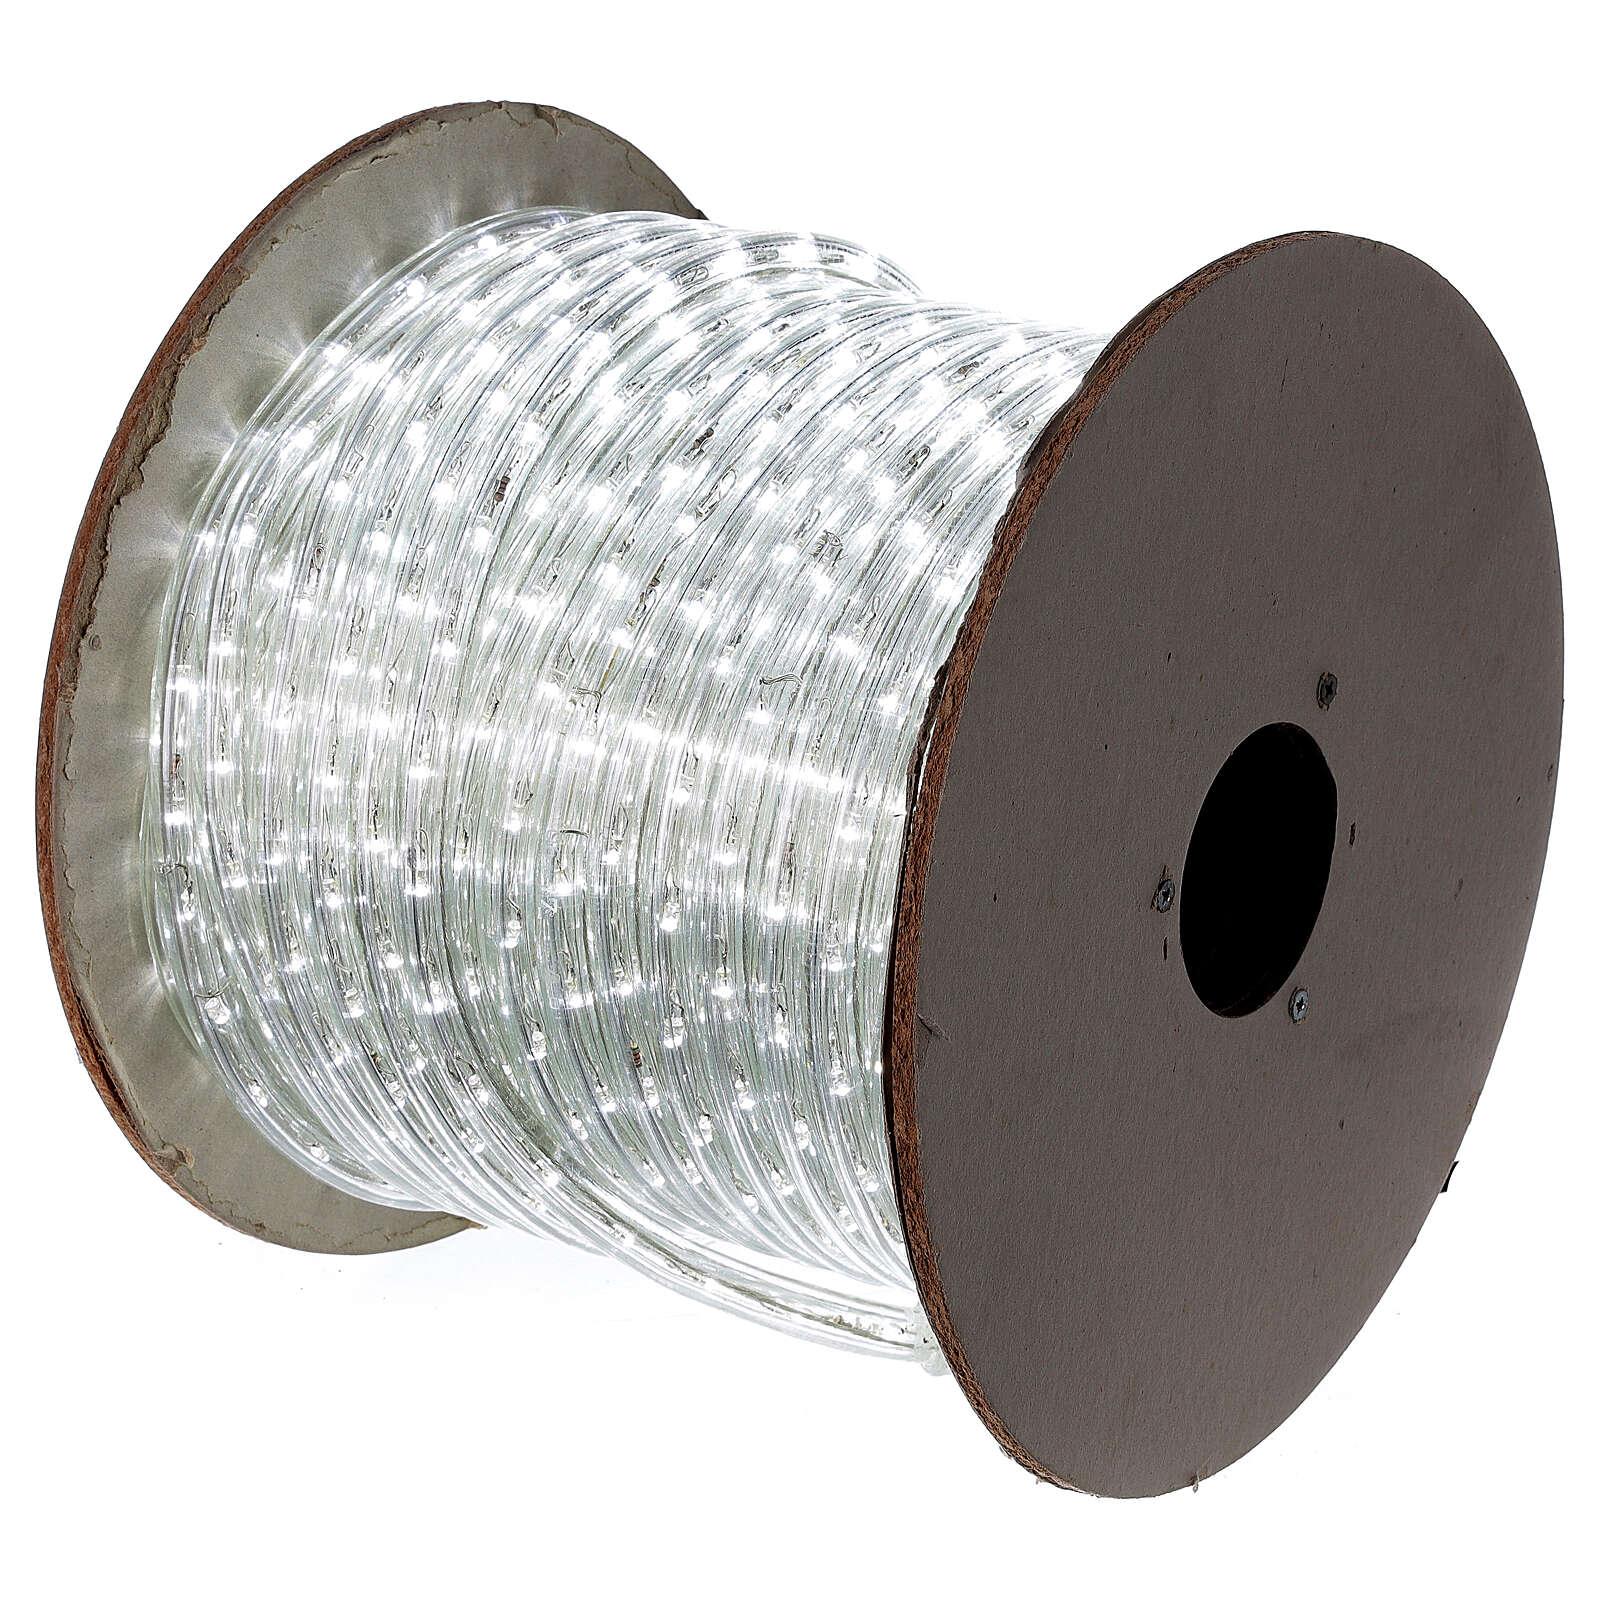 Tubo 2 fili lampadine led PROFESSIONAL 44 m bianco freddo corrente ESTERNO 3